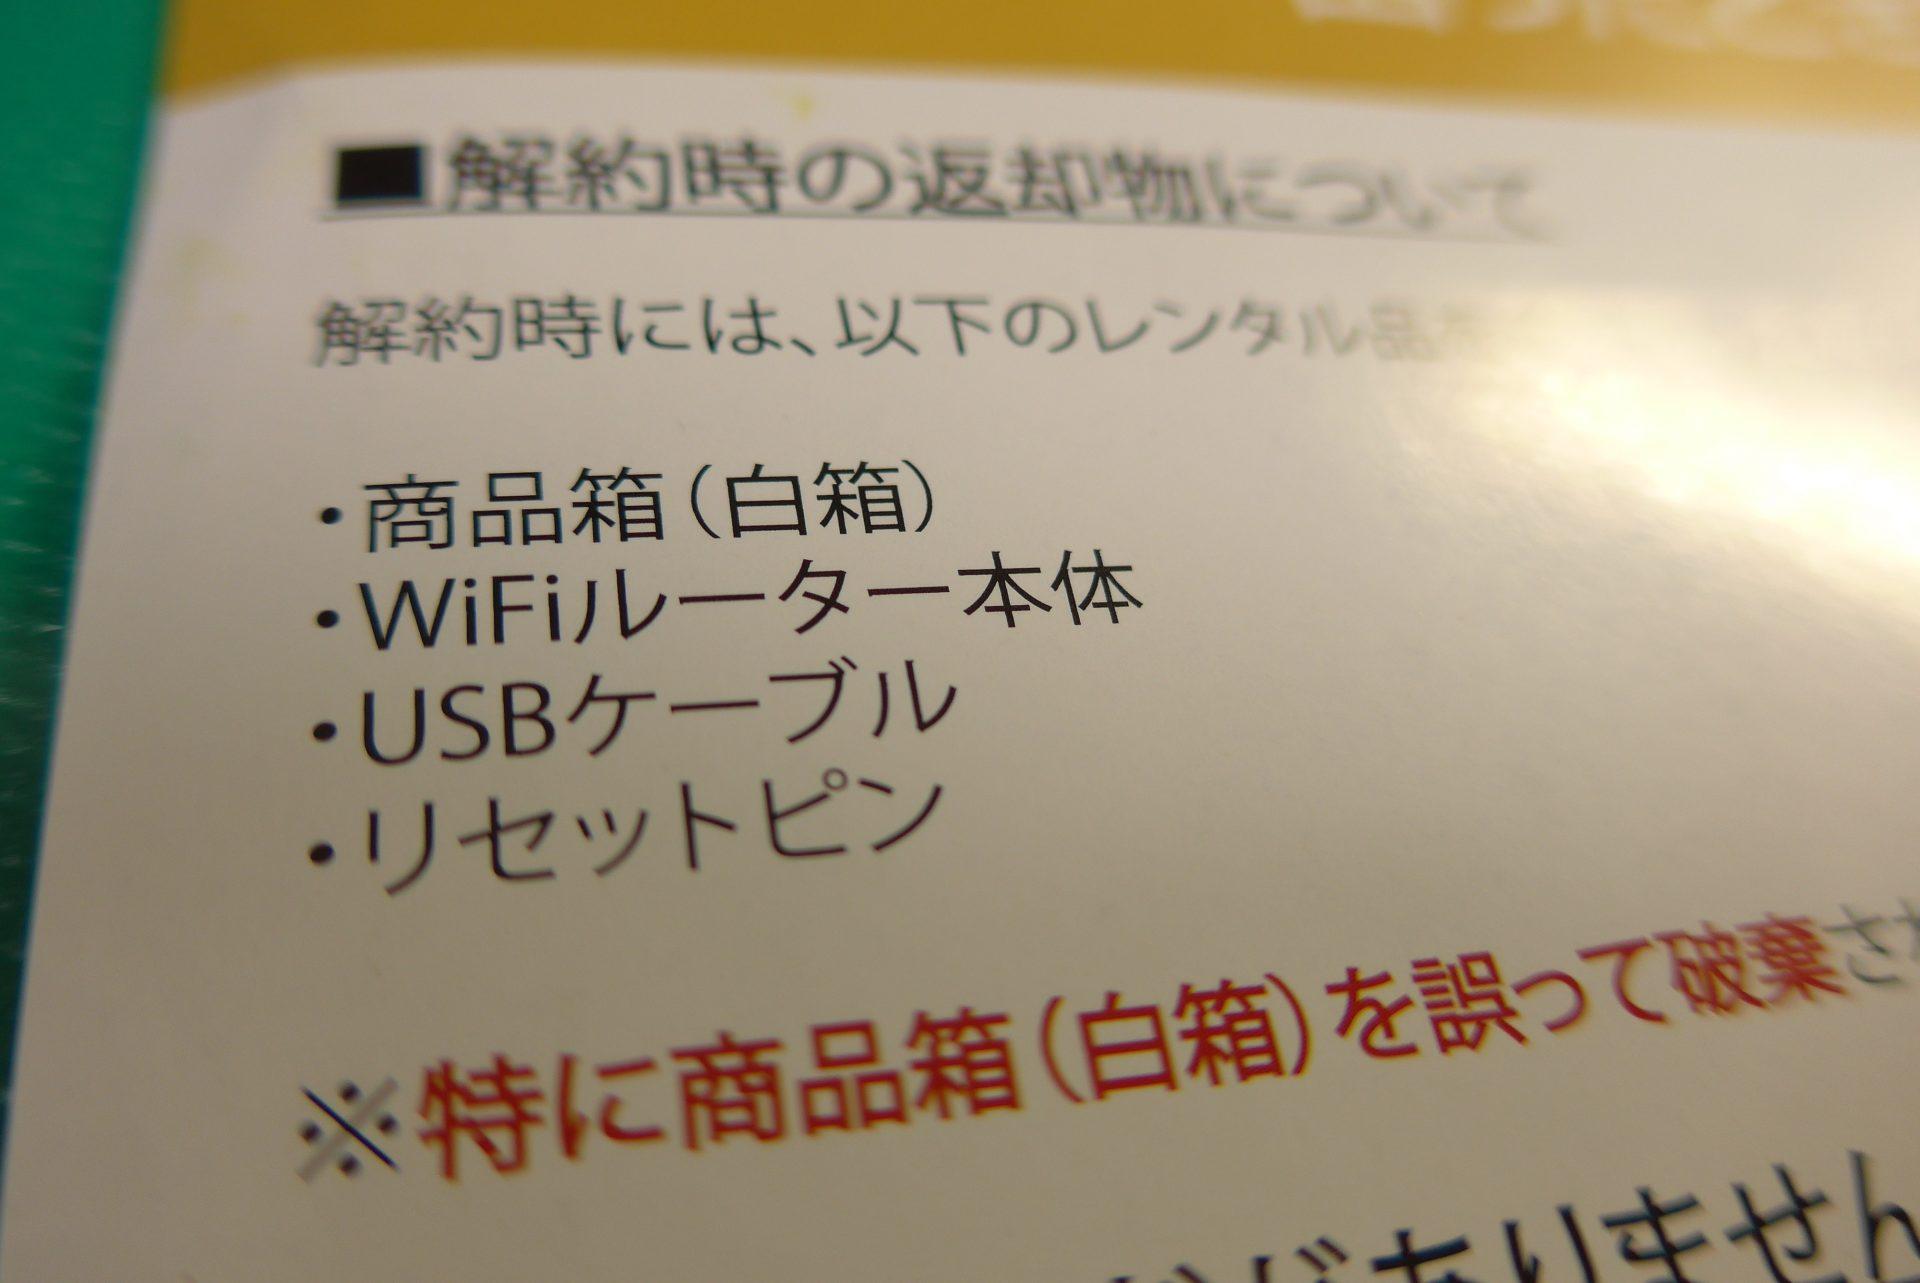 (K)クラウドWi-FiのU3はオススメ!エリア広く解約金なし